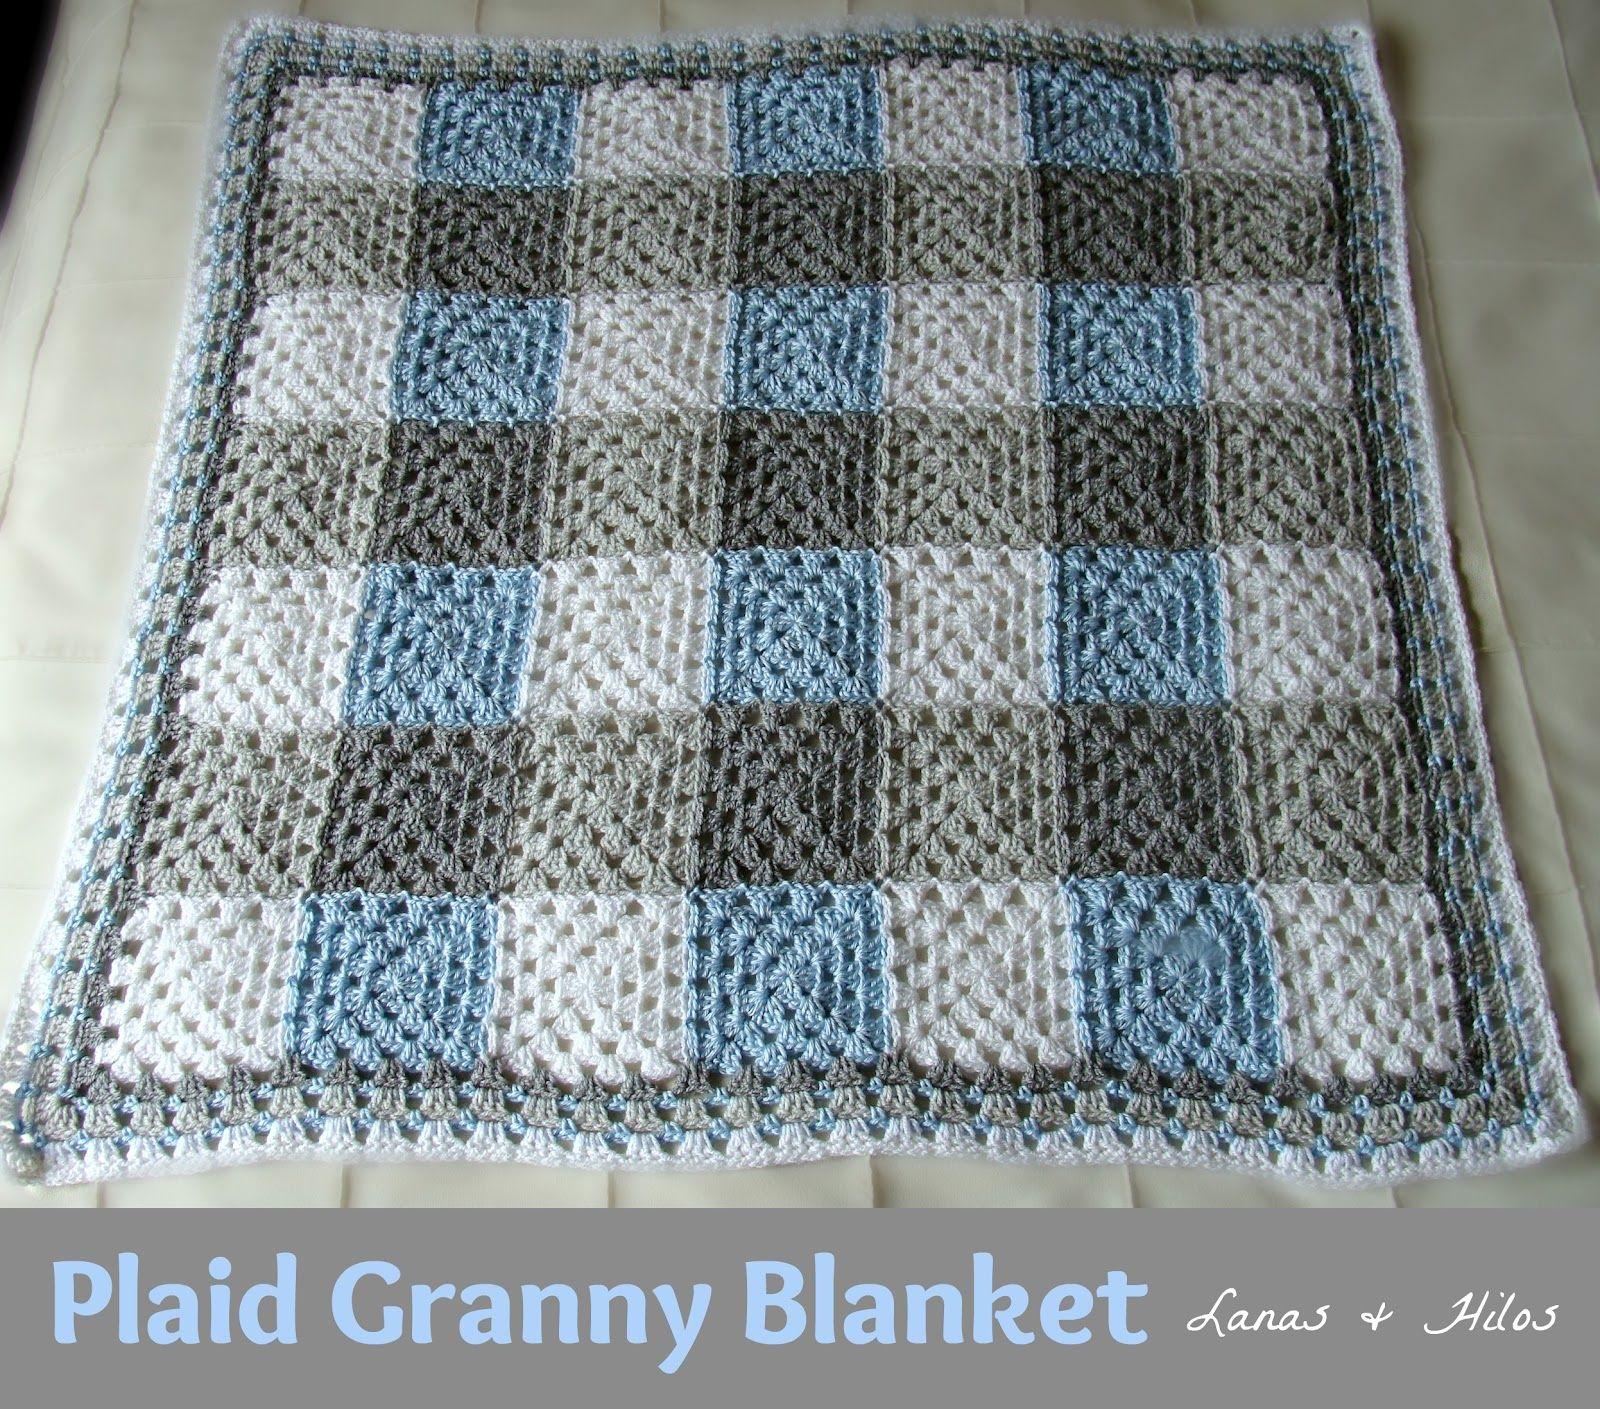 Plaid Granny Blanket This Will Be My Next Baby Blanket Haken En